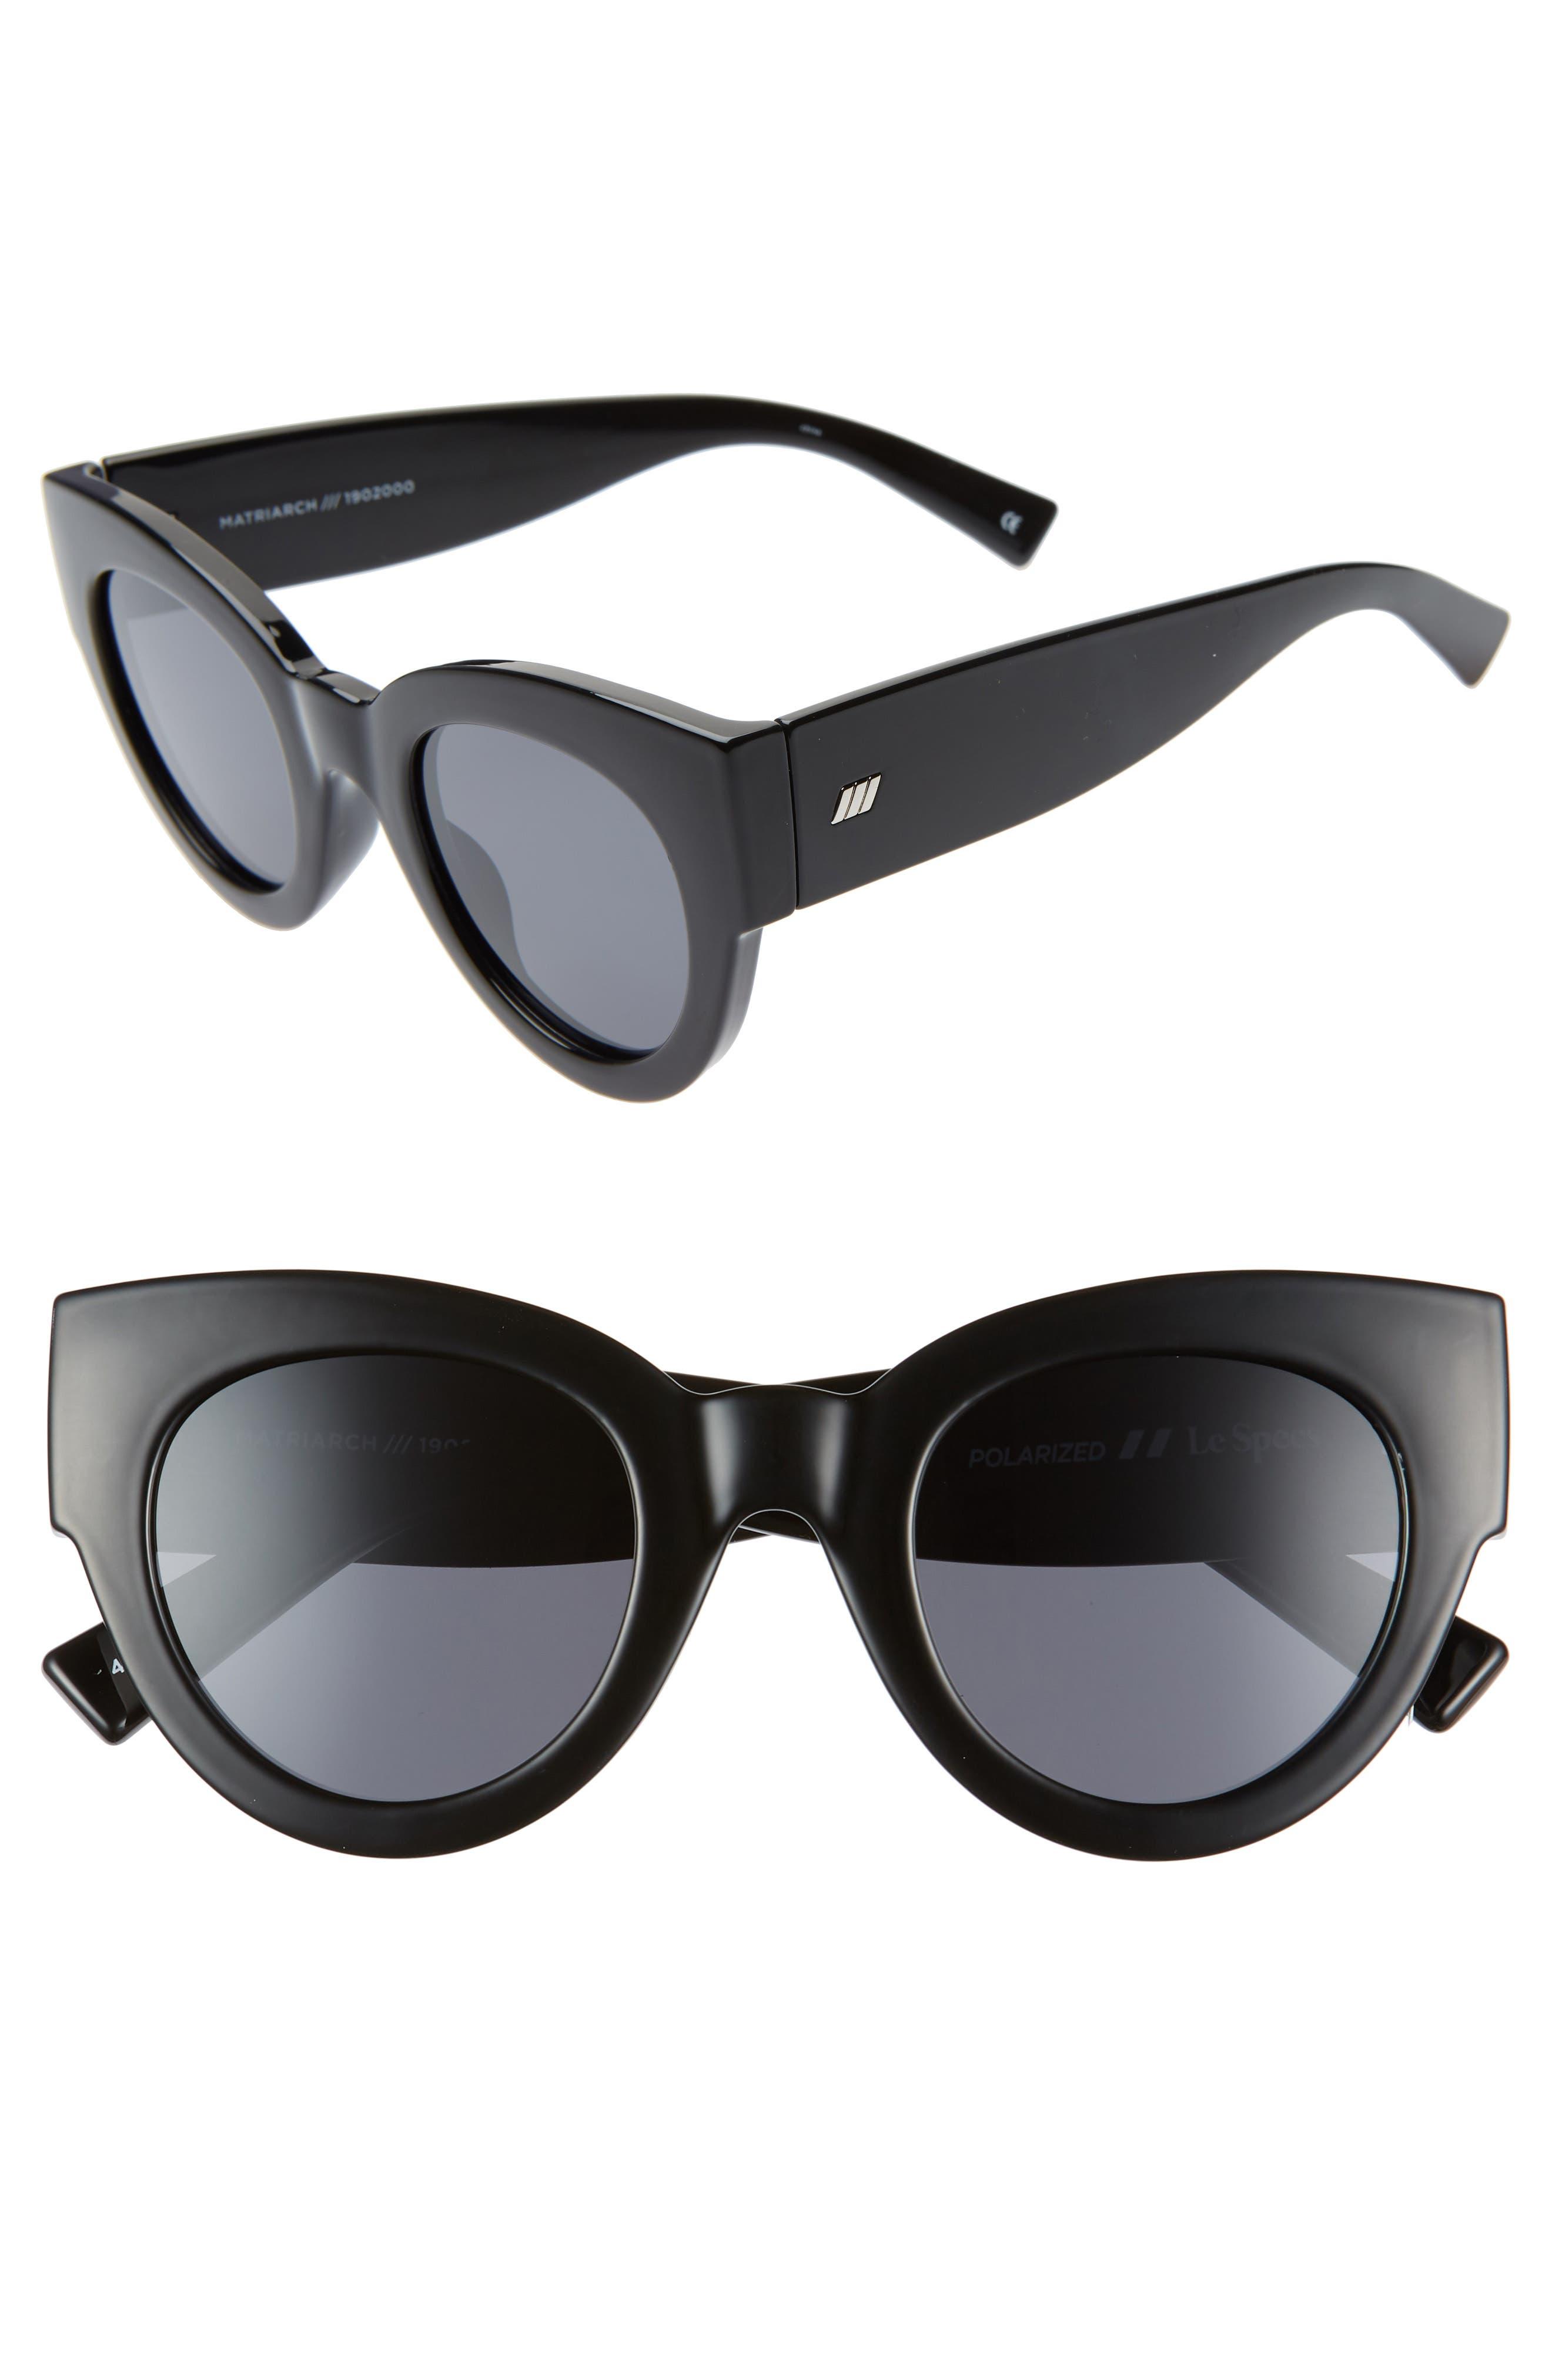 Le Specs Matriarch 4m Polarized Cat Eye Sunglasses - Black/ Black